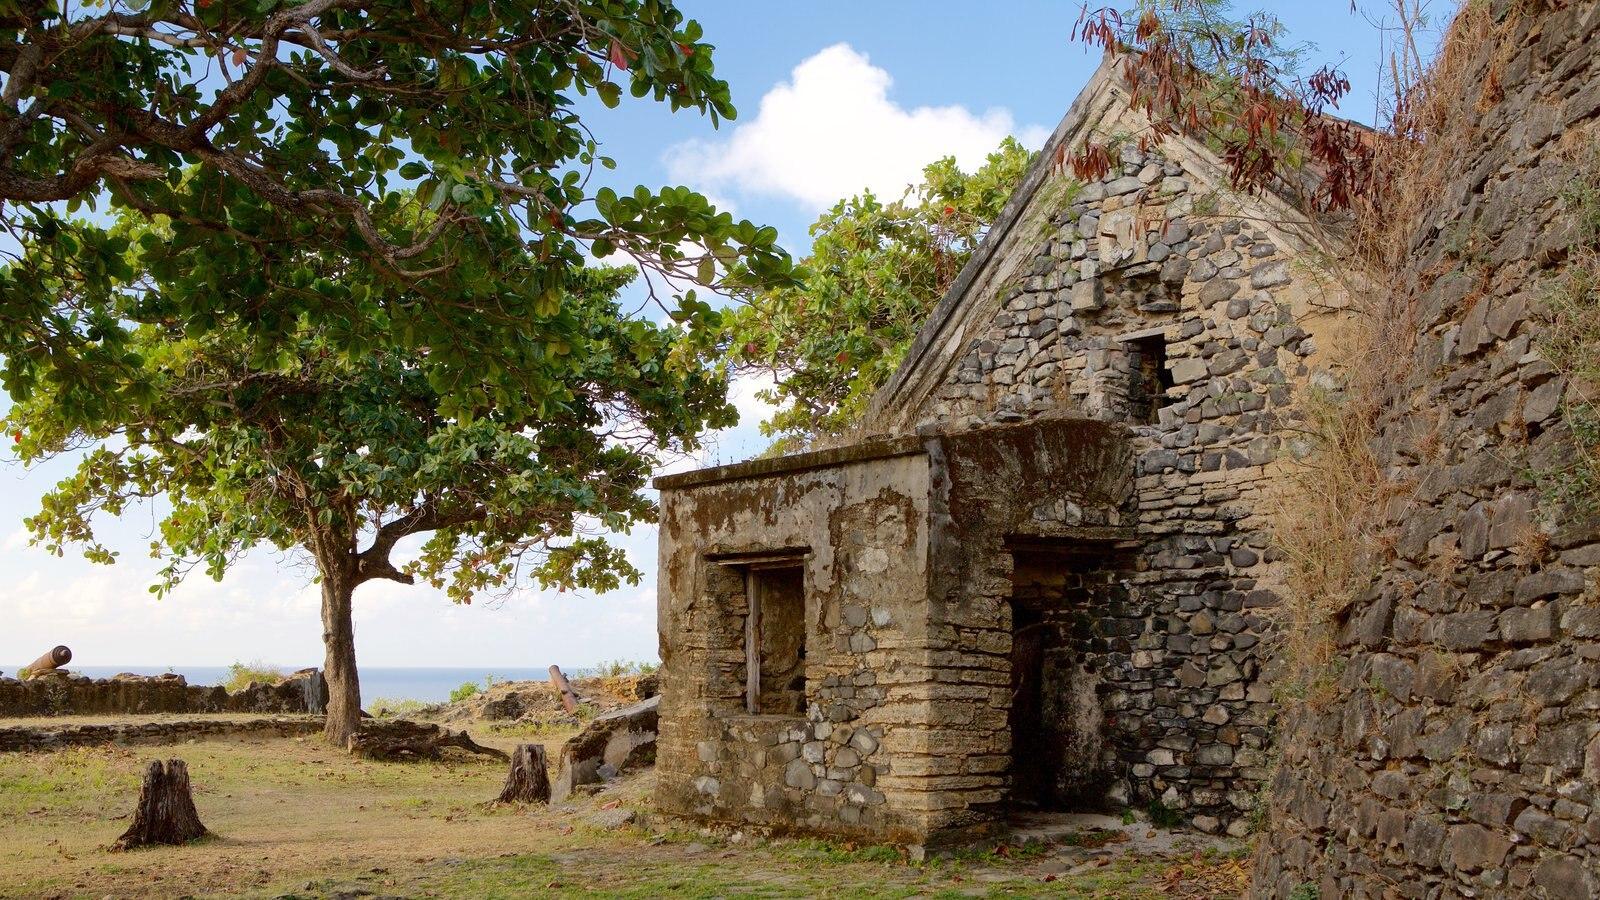 Forte dos Remédios caracterizando ruínas de edifício, paisagens litorâneas e elementos de patrimônio